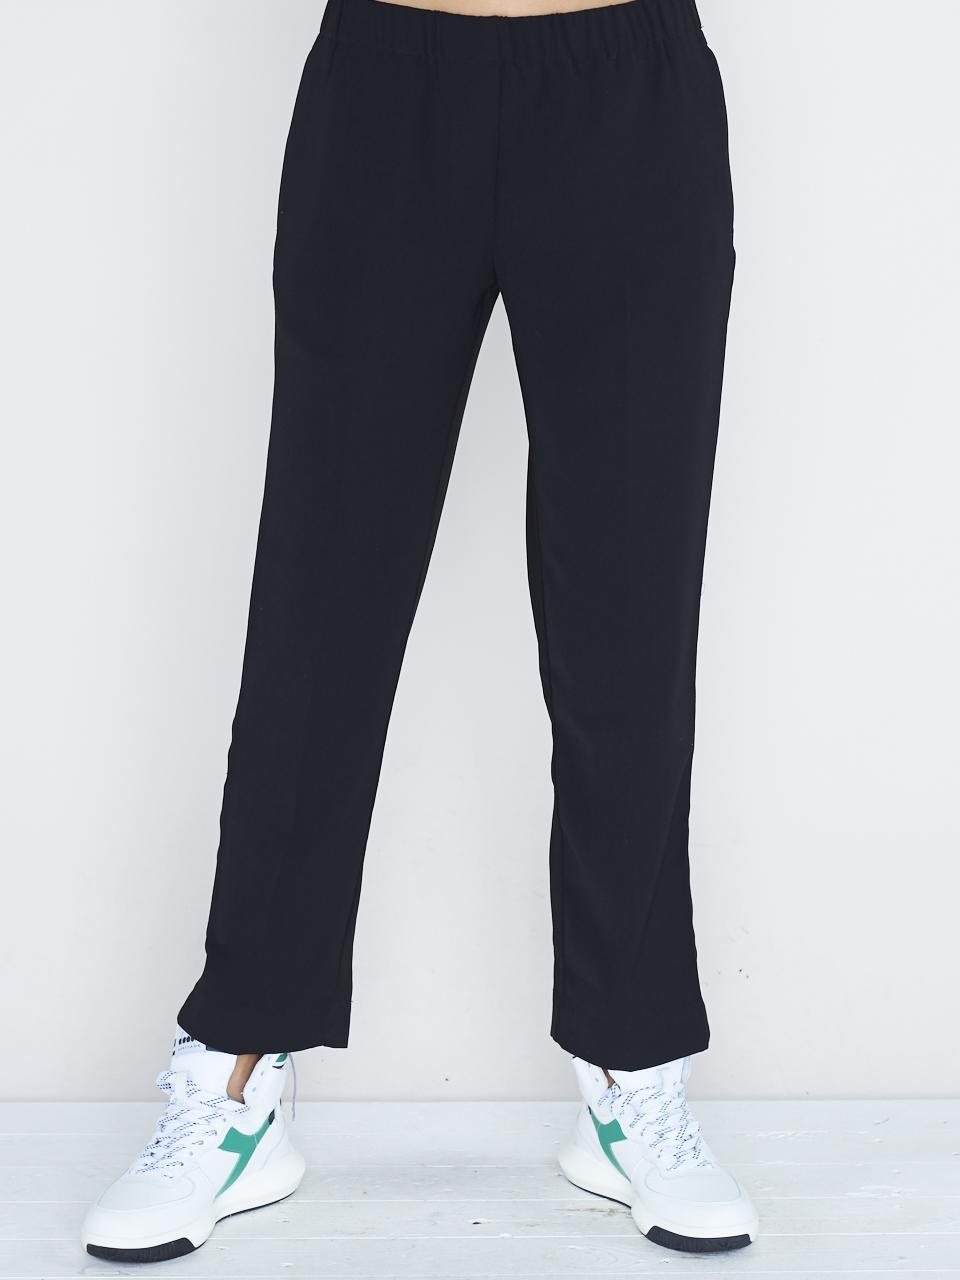 PANTS HOYS 9711